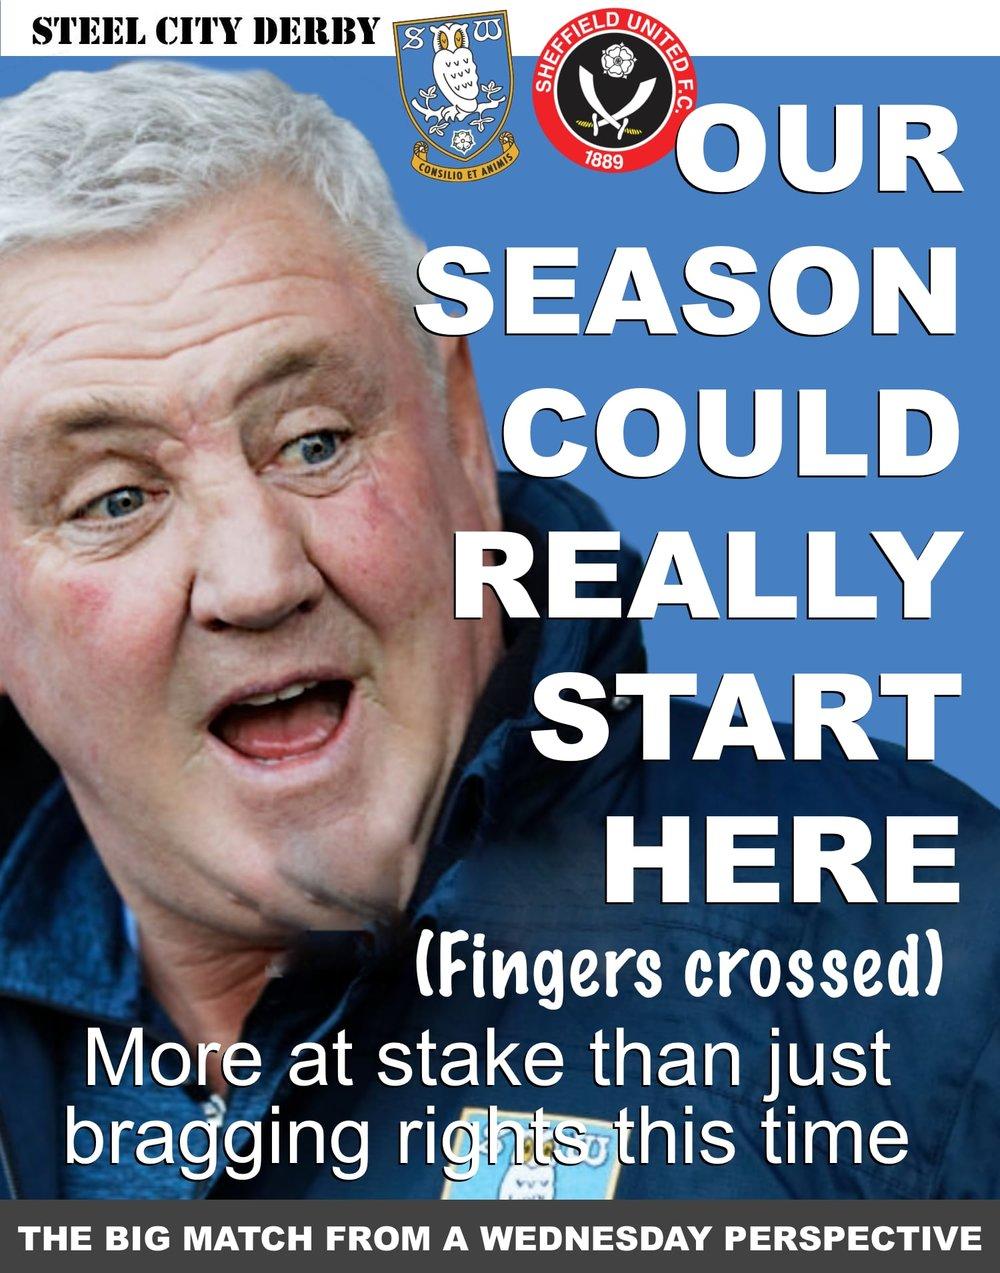 Make or break for Sheffield Wednesday in winner-takes-all showdown with neighbours Sheffield United at Hillsborough.